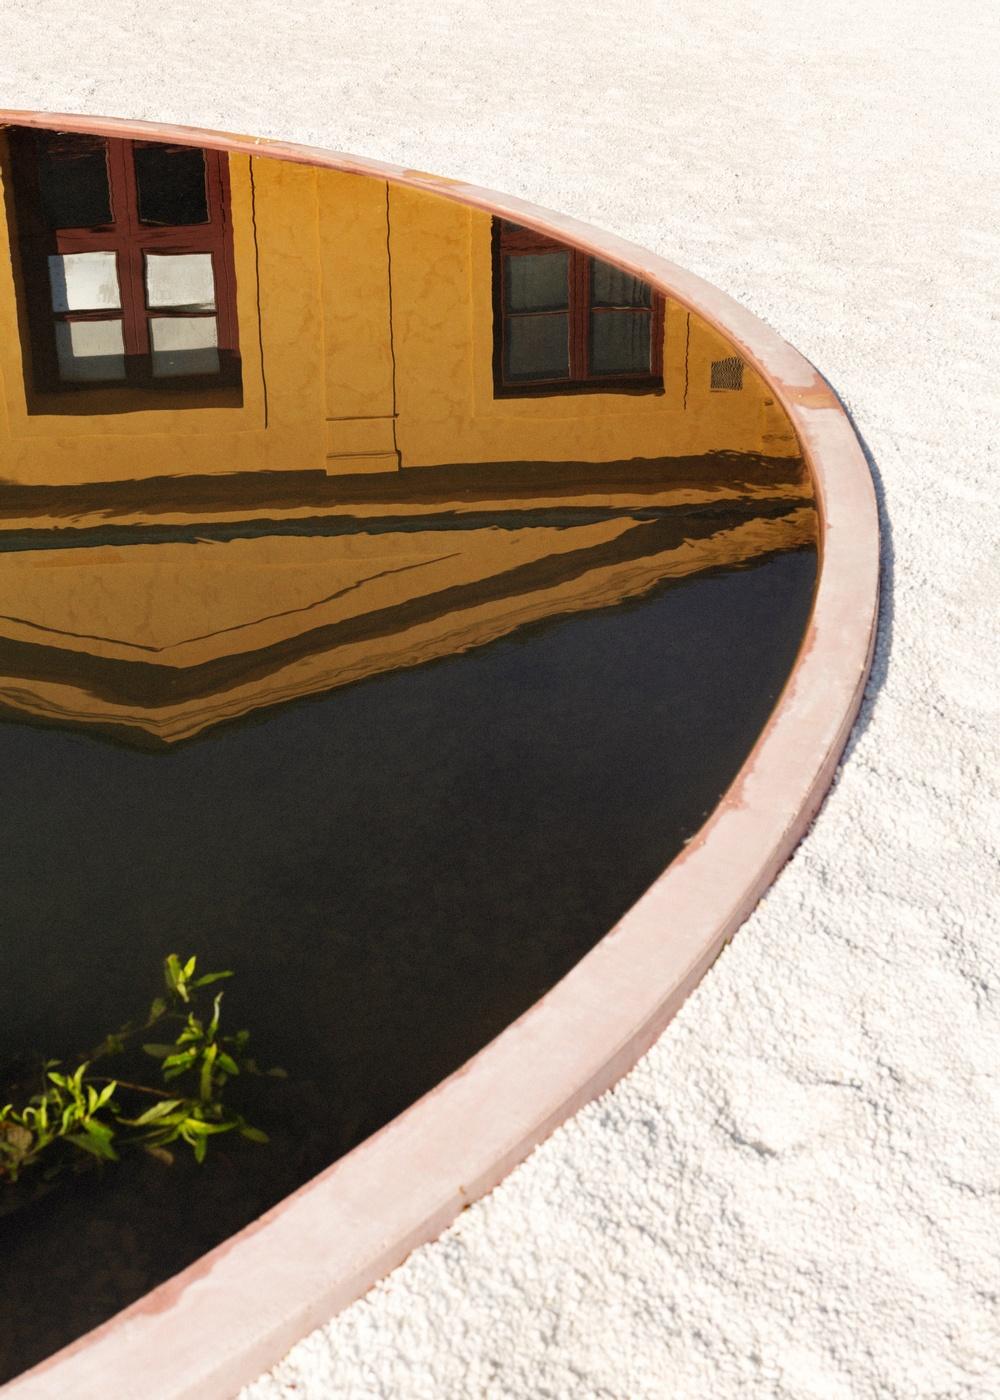 The Pond 'Studio Ossidiana: Utomhusverket 2021'. Photograph: Märta Thisner. Courtesy of ArkDes.